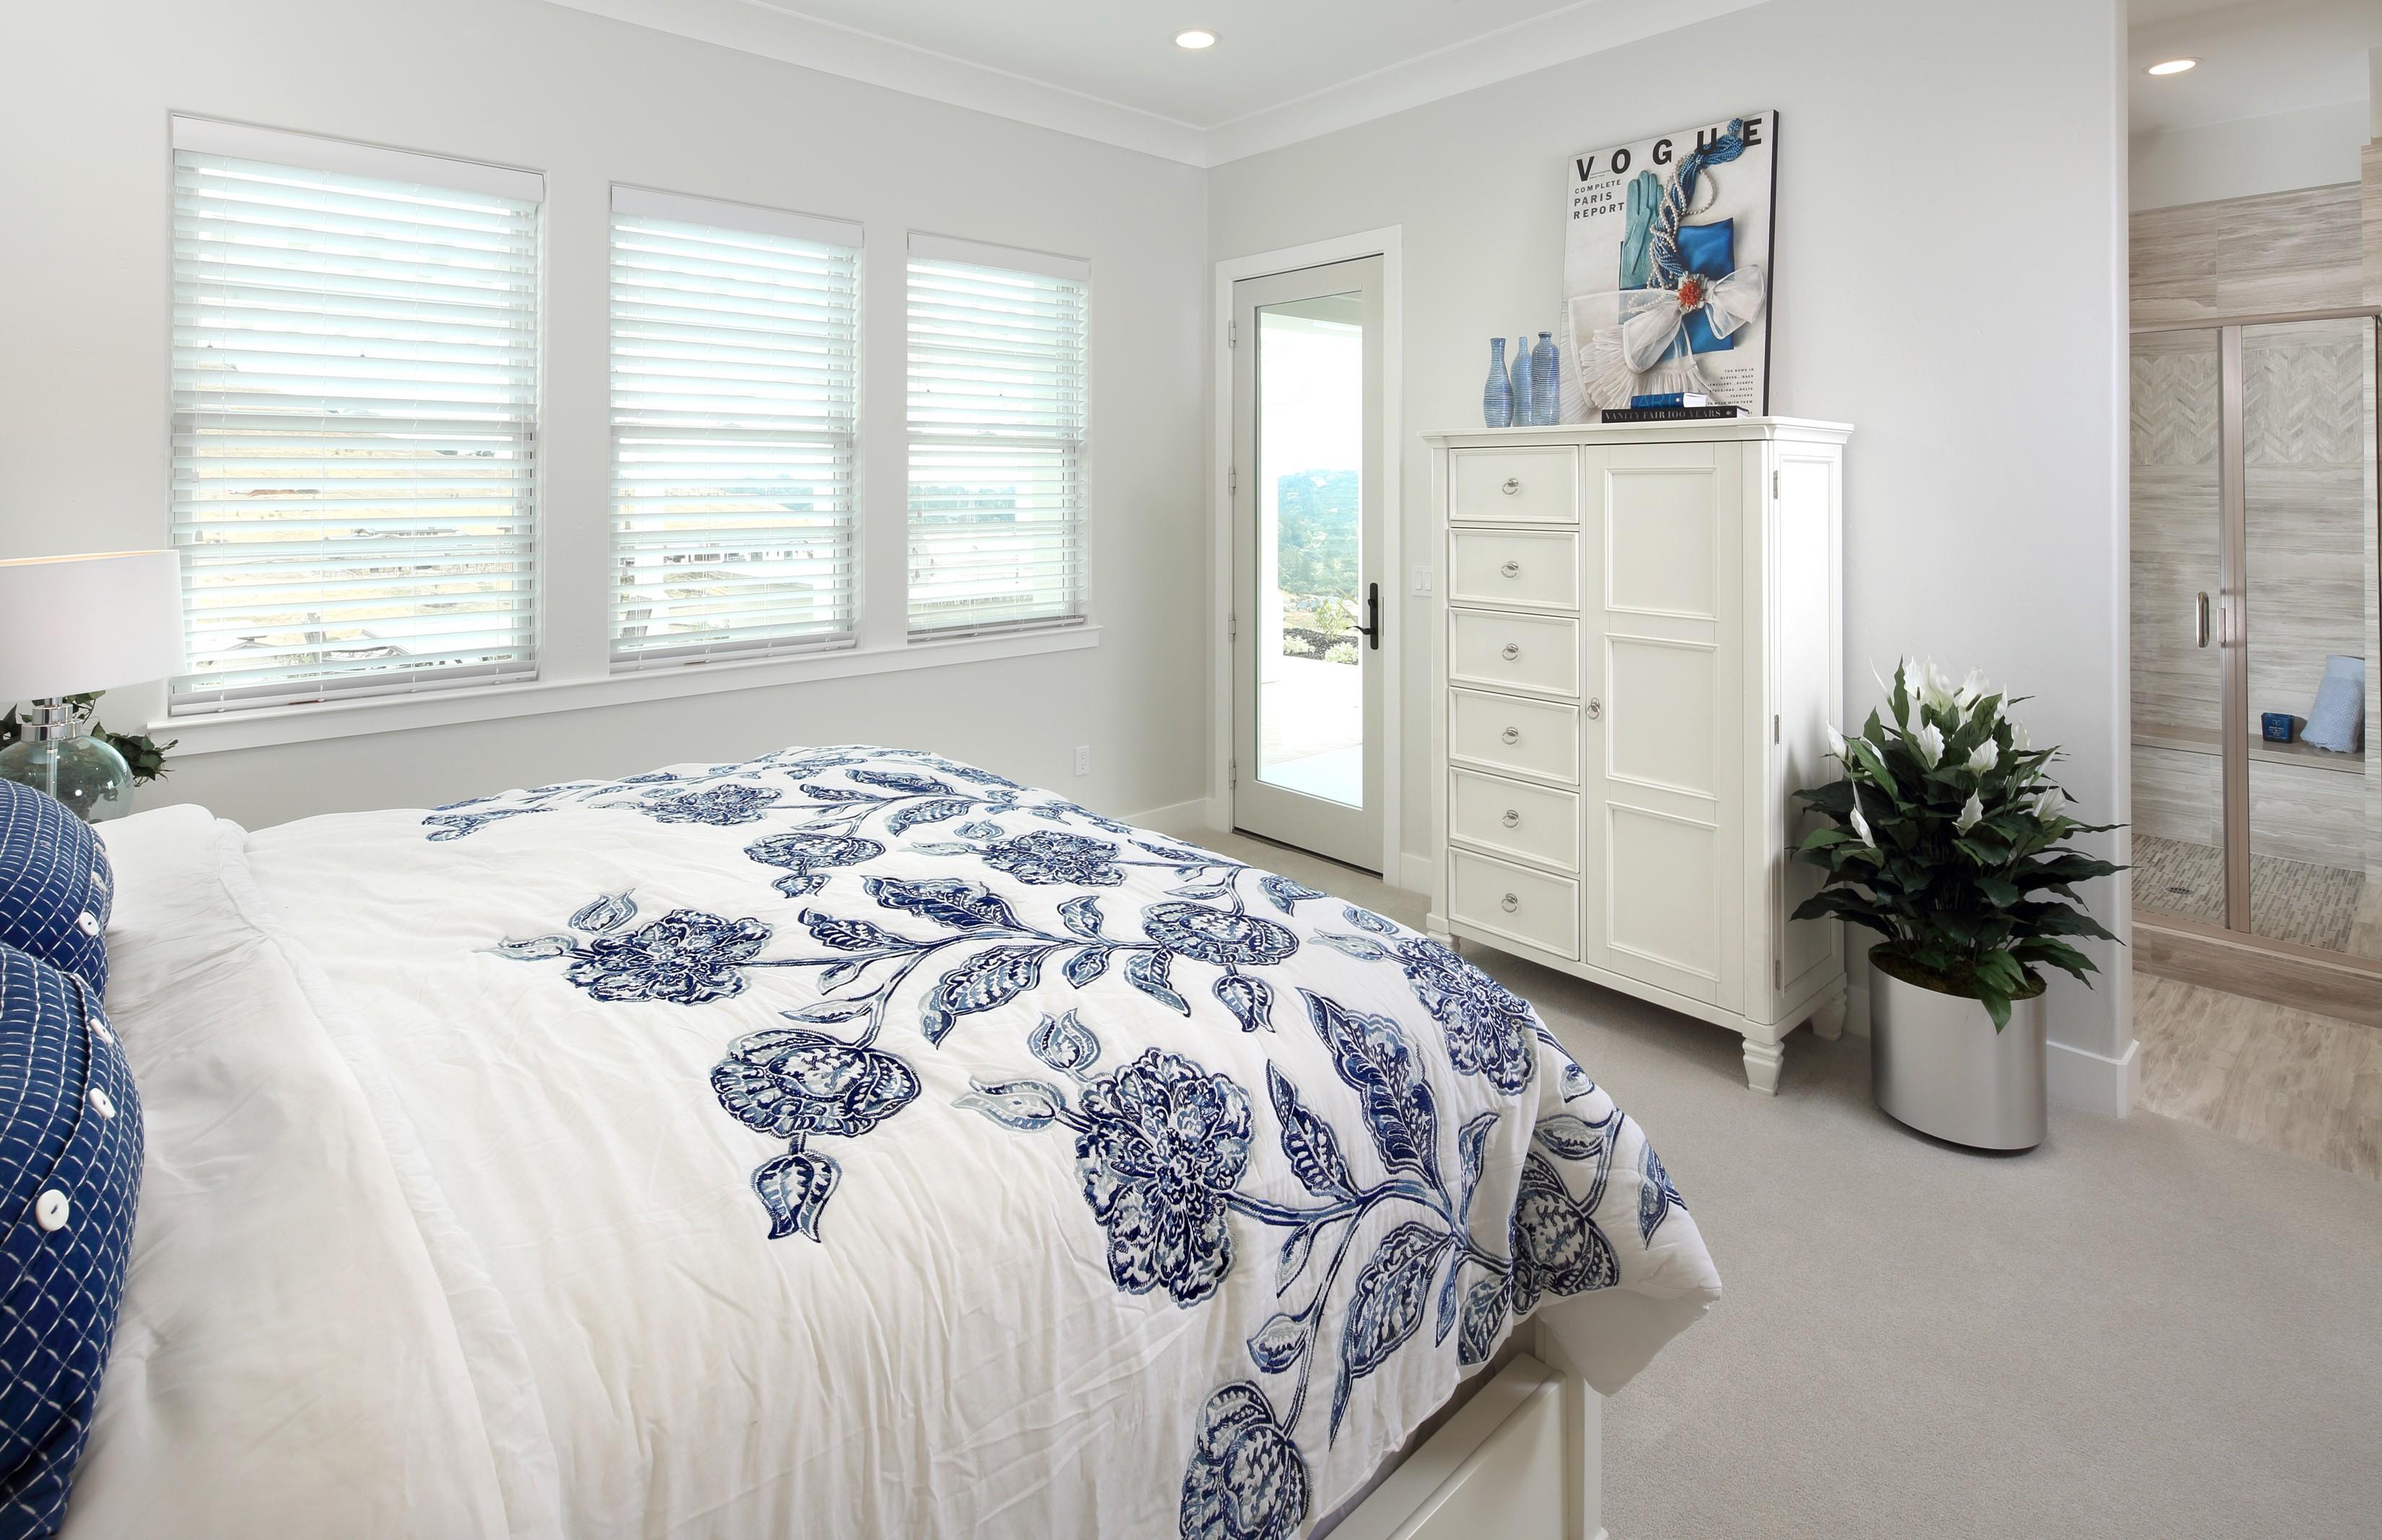 Bedroom flooring and window treatment   Elite Builder Services